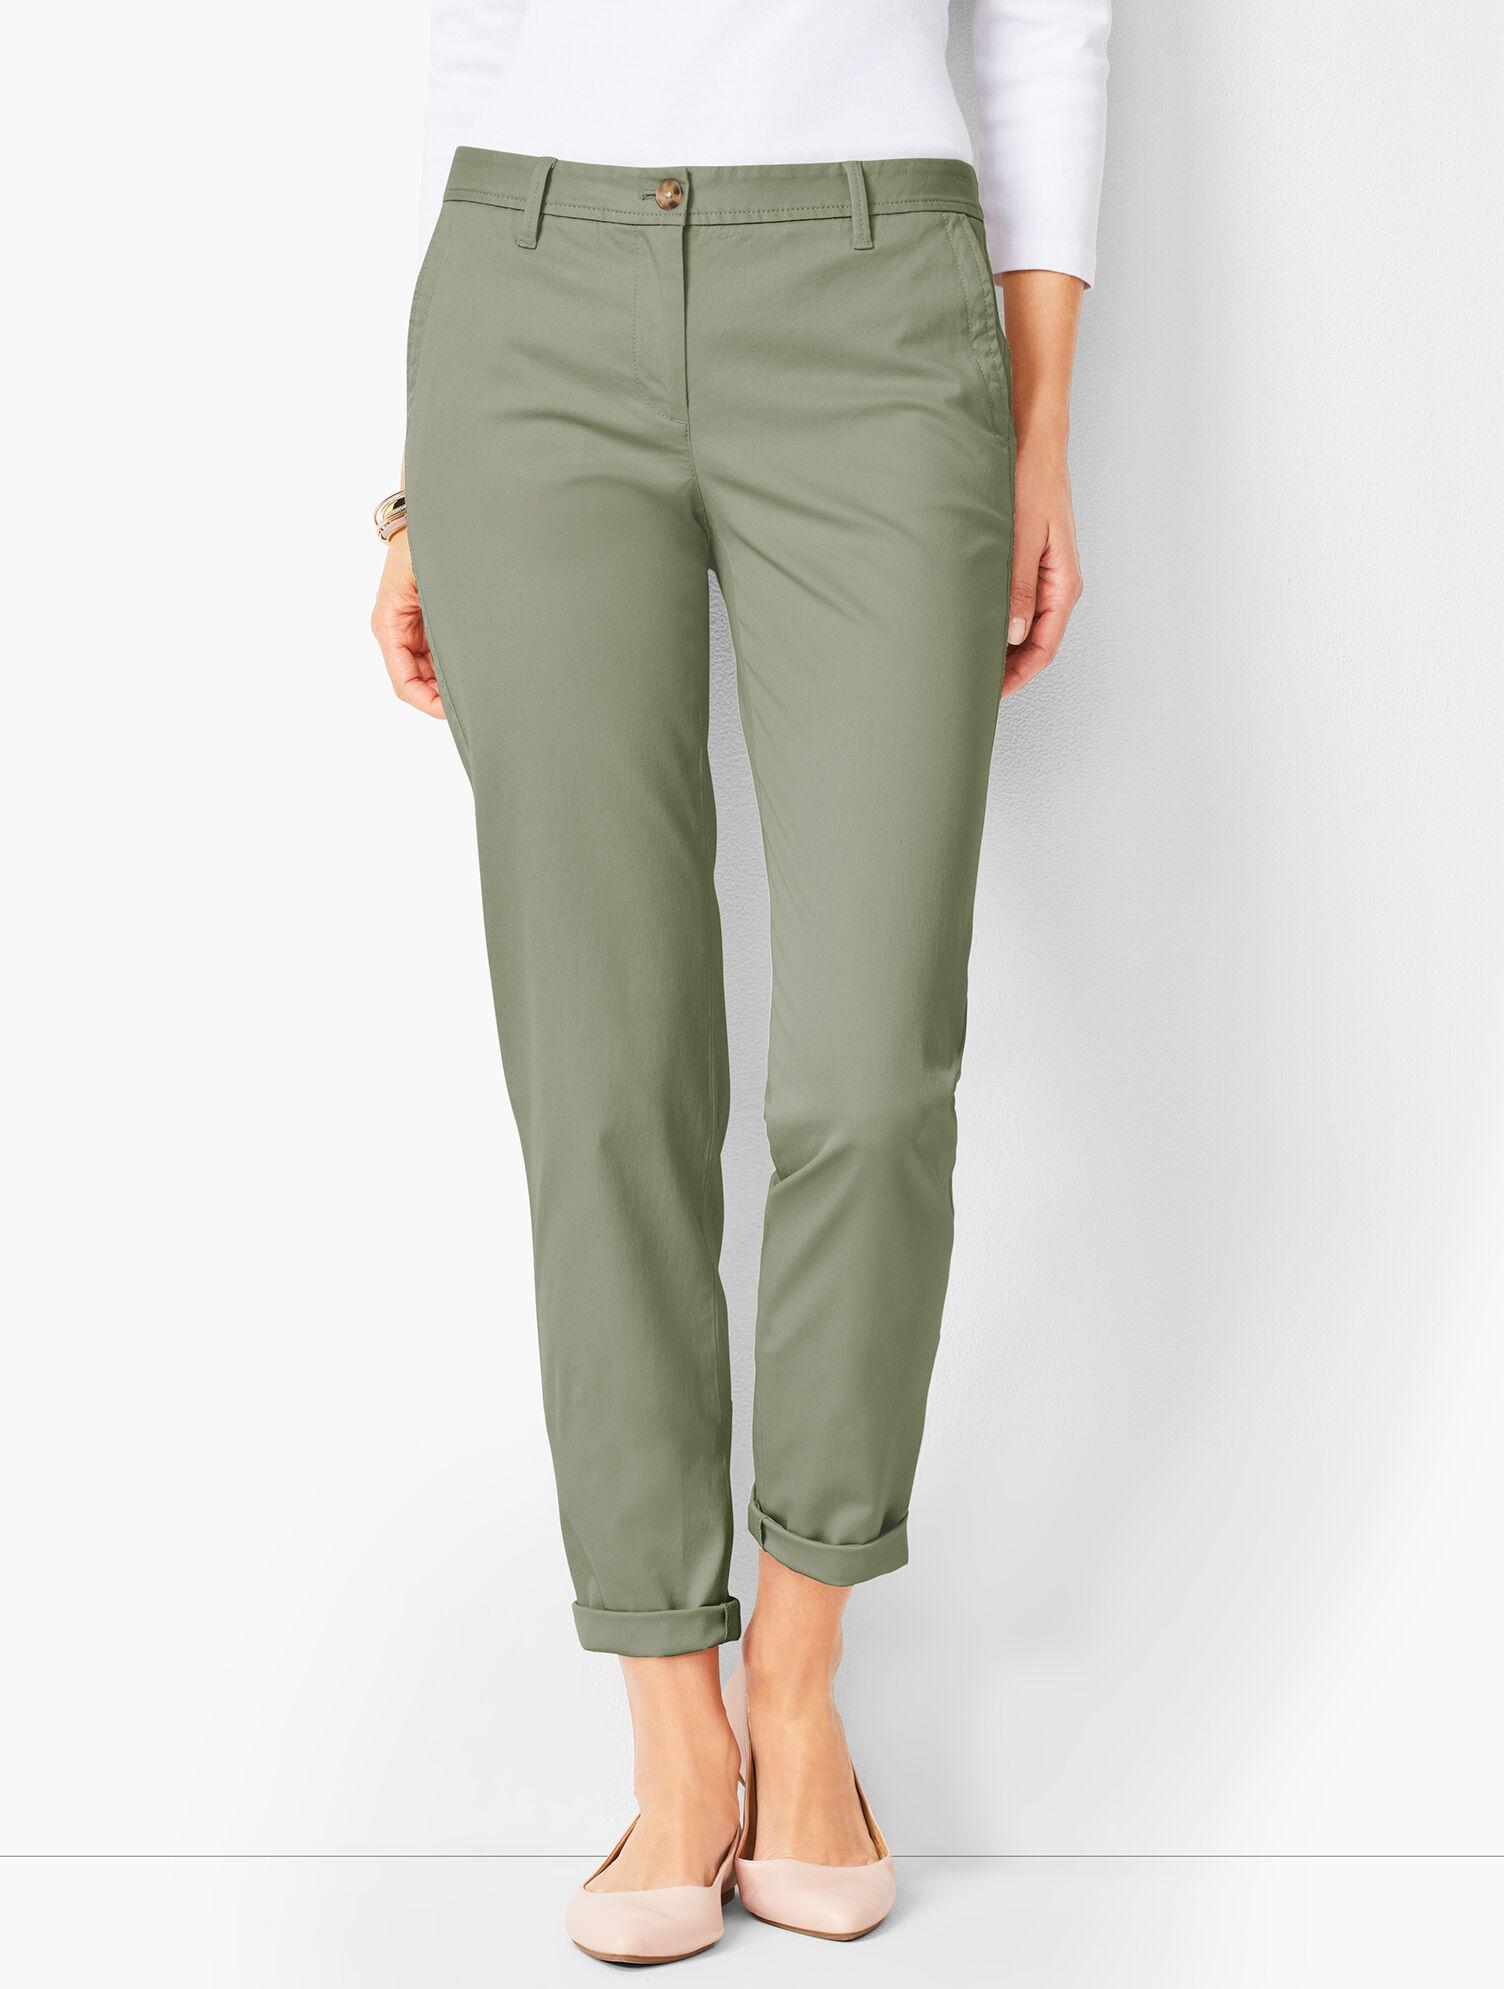 Women's Clothing Talbots Womens Size 6 Chino Khaki Pants Cotton Blend New